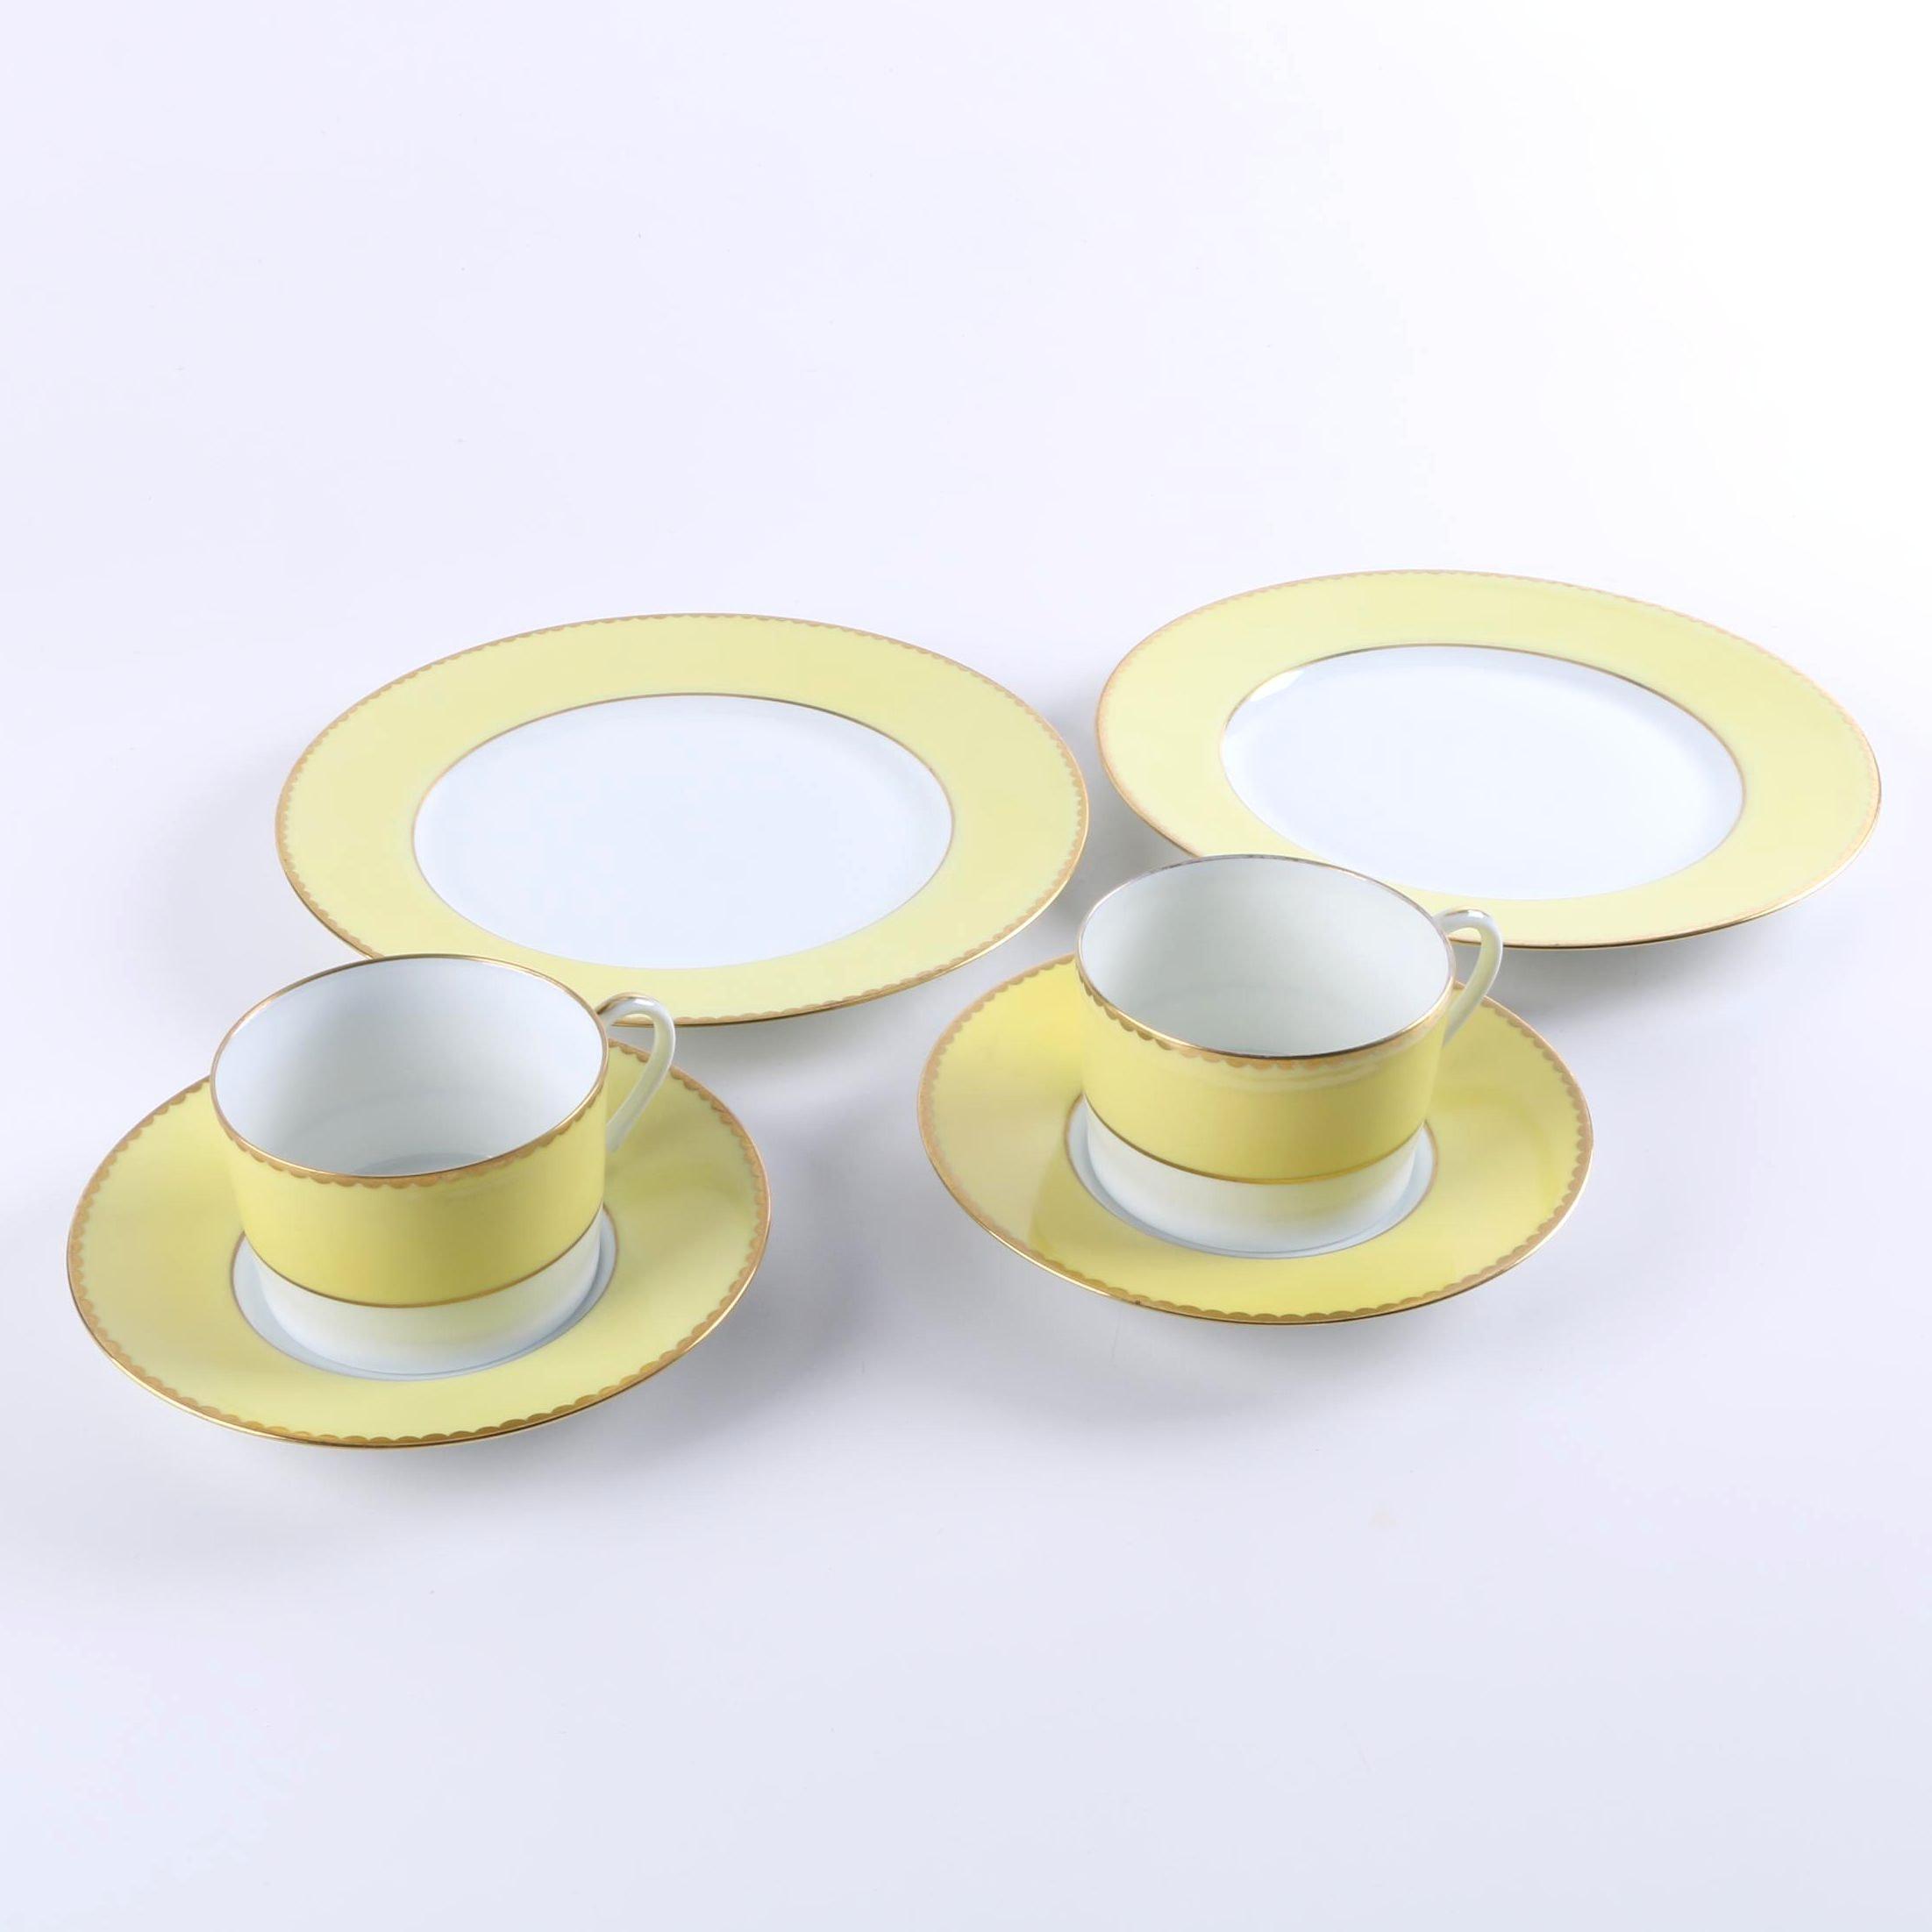 Limoges for Tiffany & Co. Breakfast Set